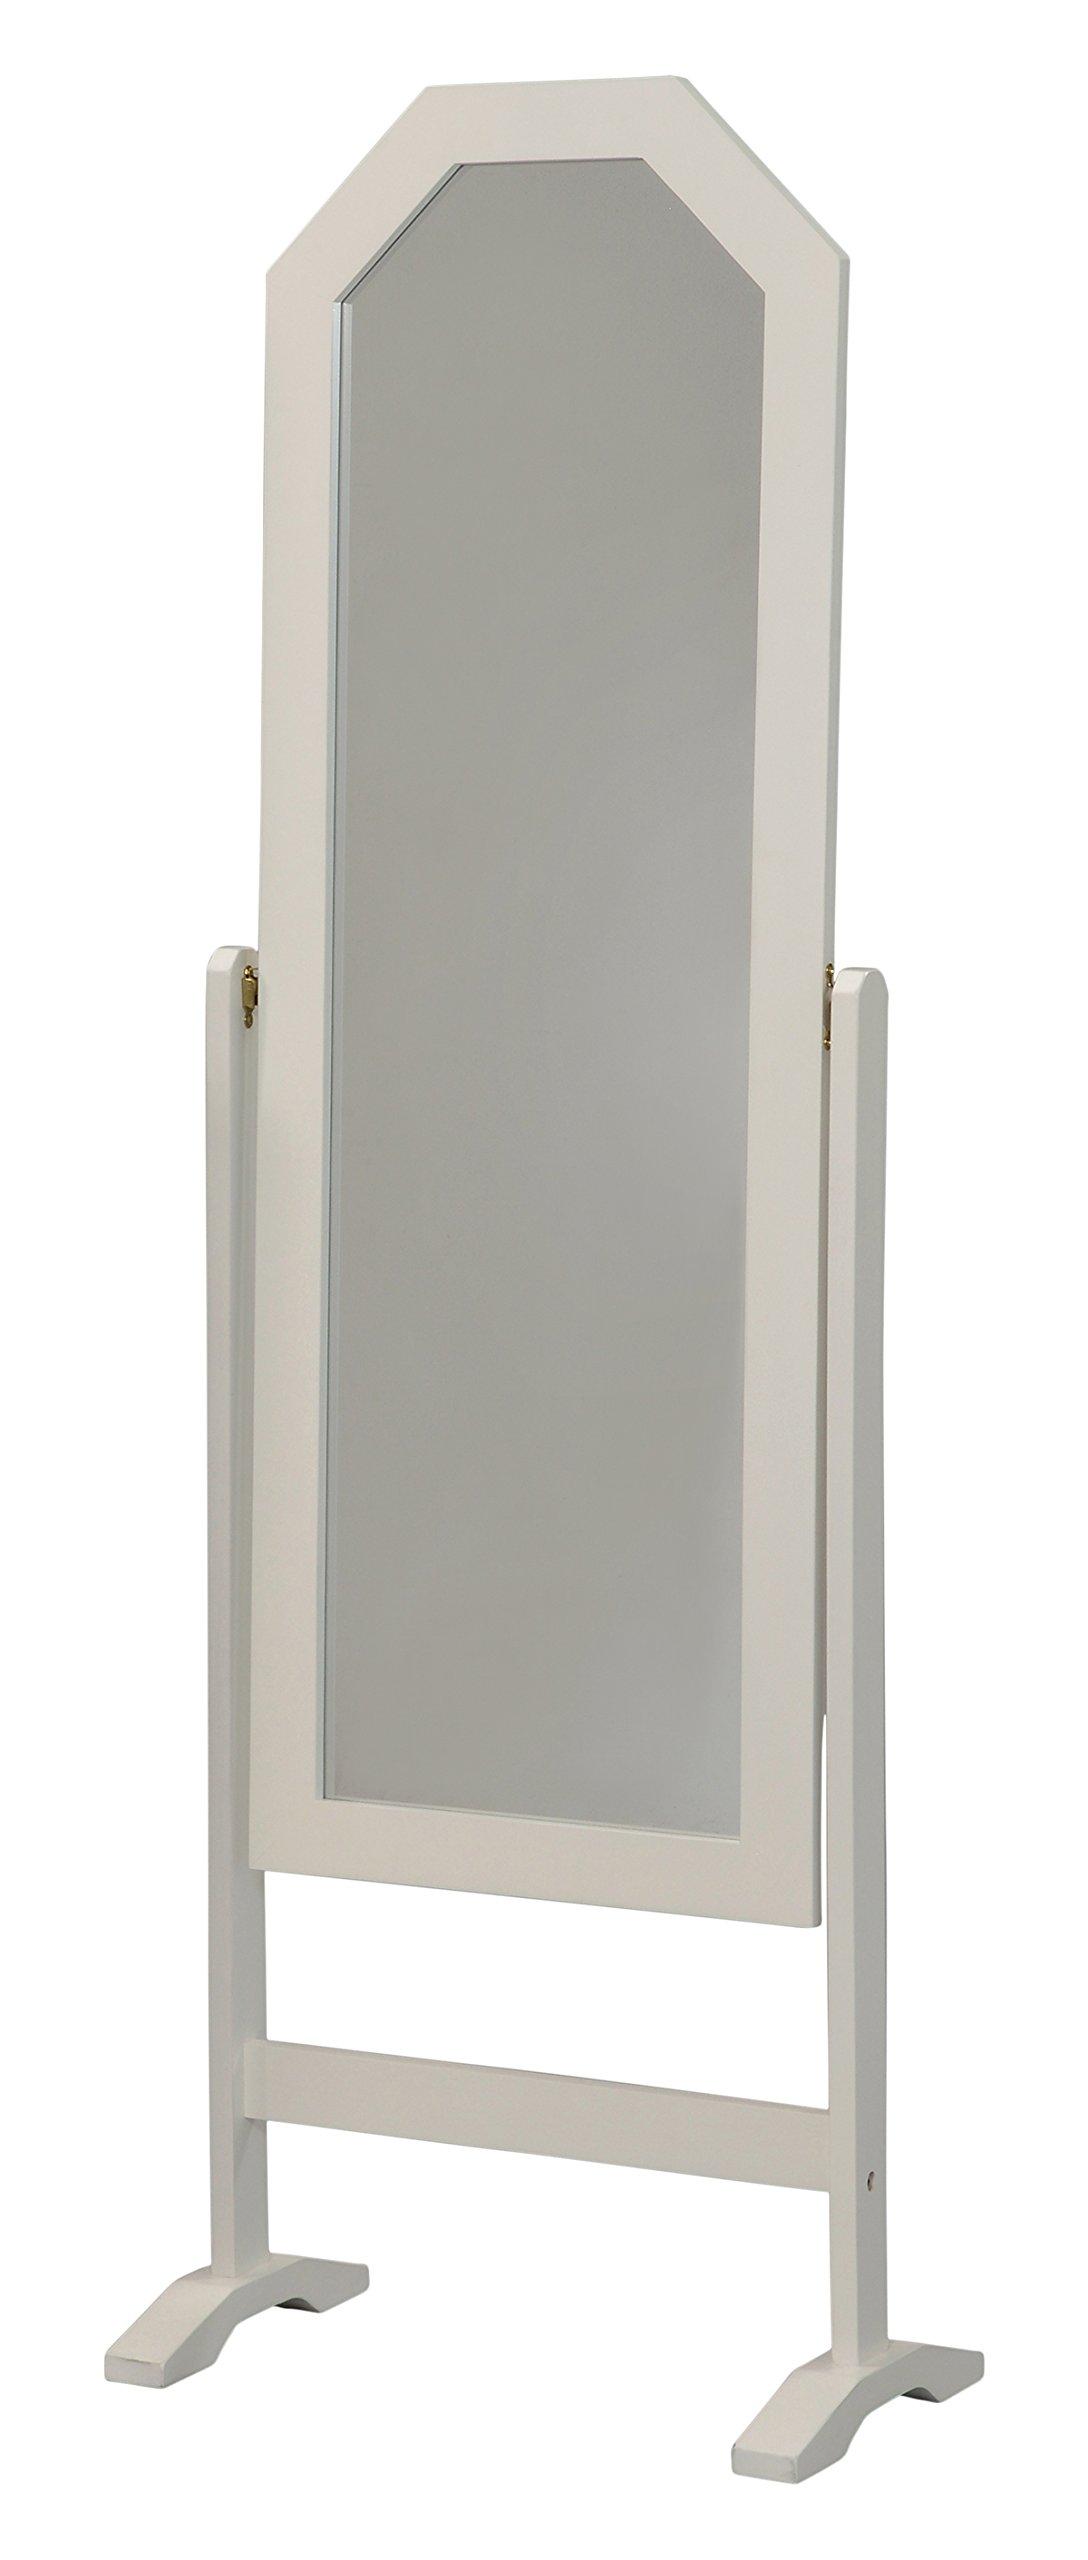 Kings Brand Furniture Biorka White Finish Wood Free Standing Rectangular Floor Mirror